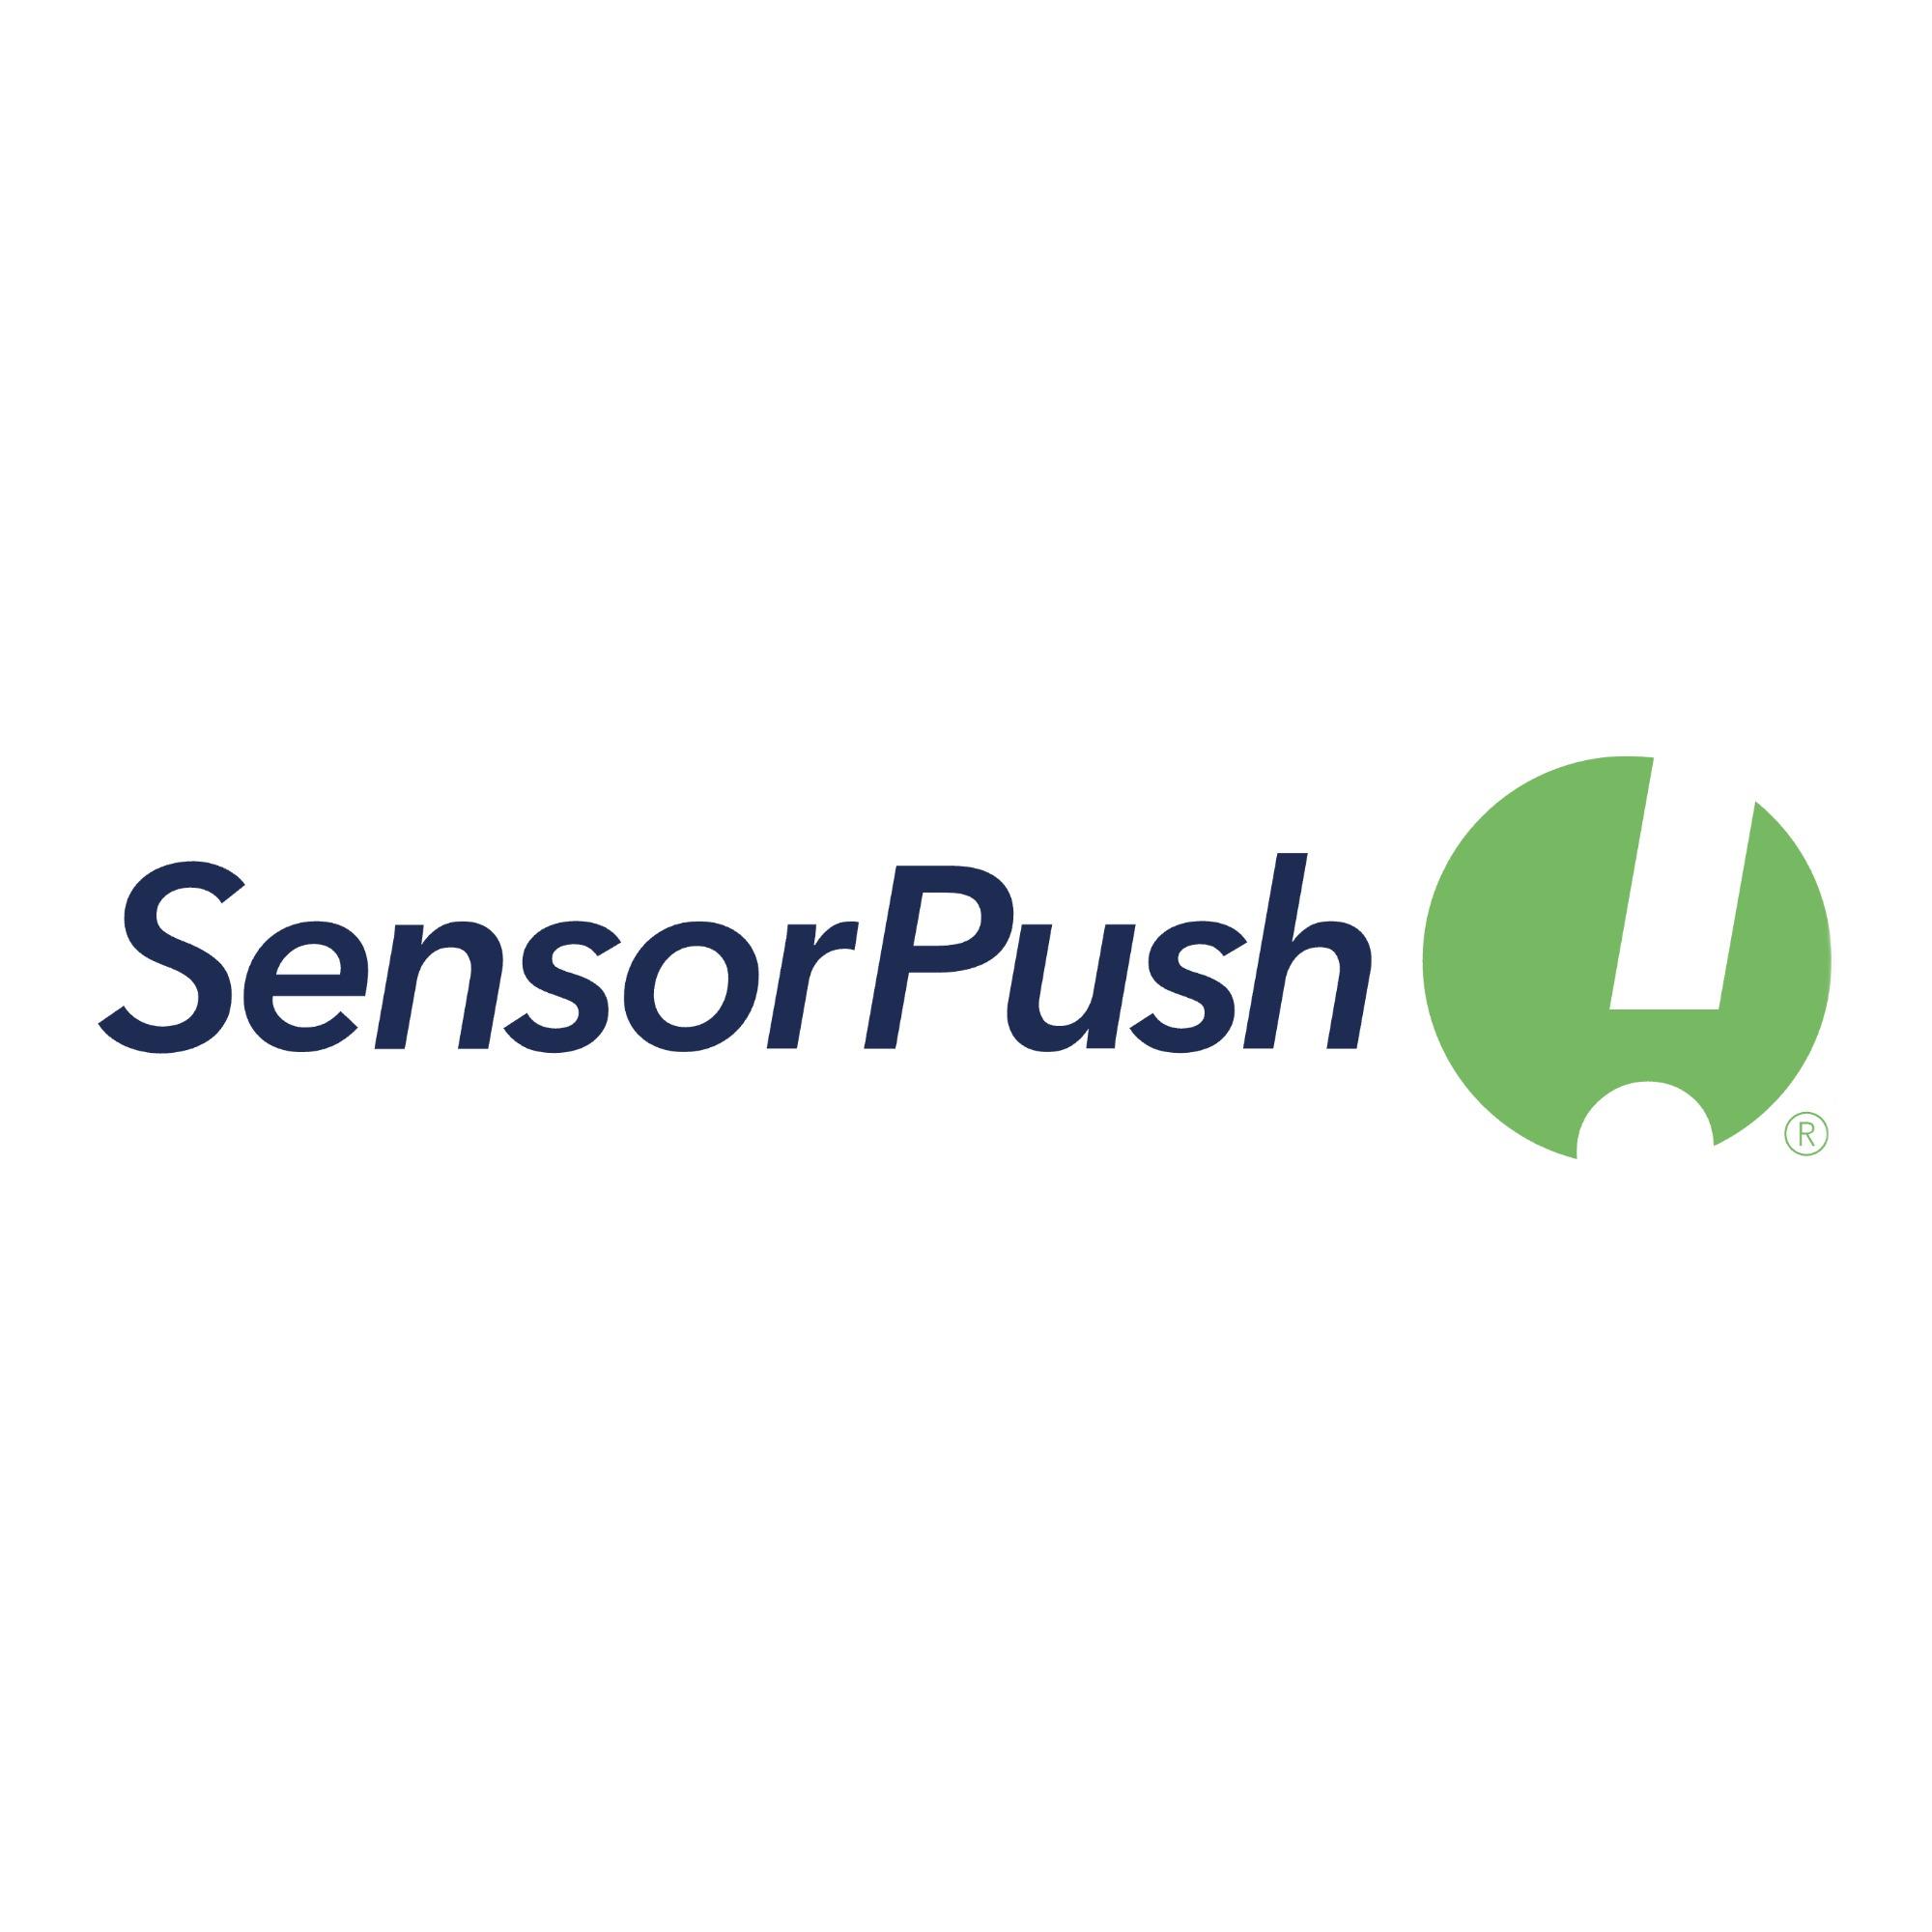 Sensor Push